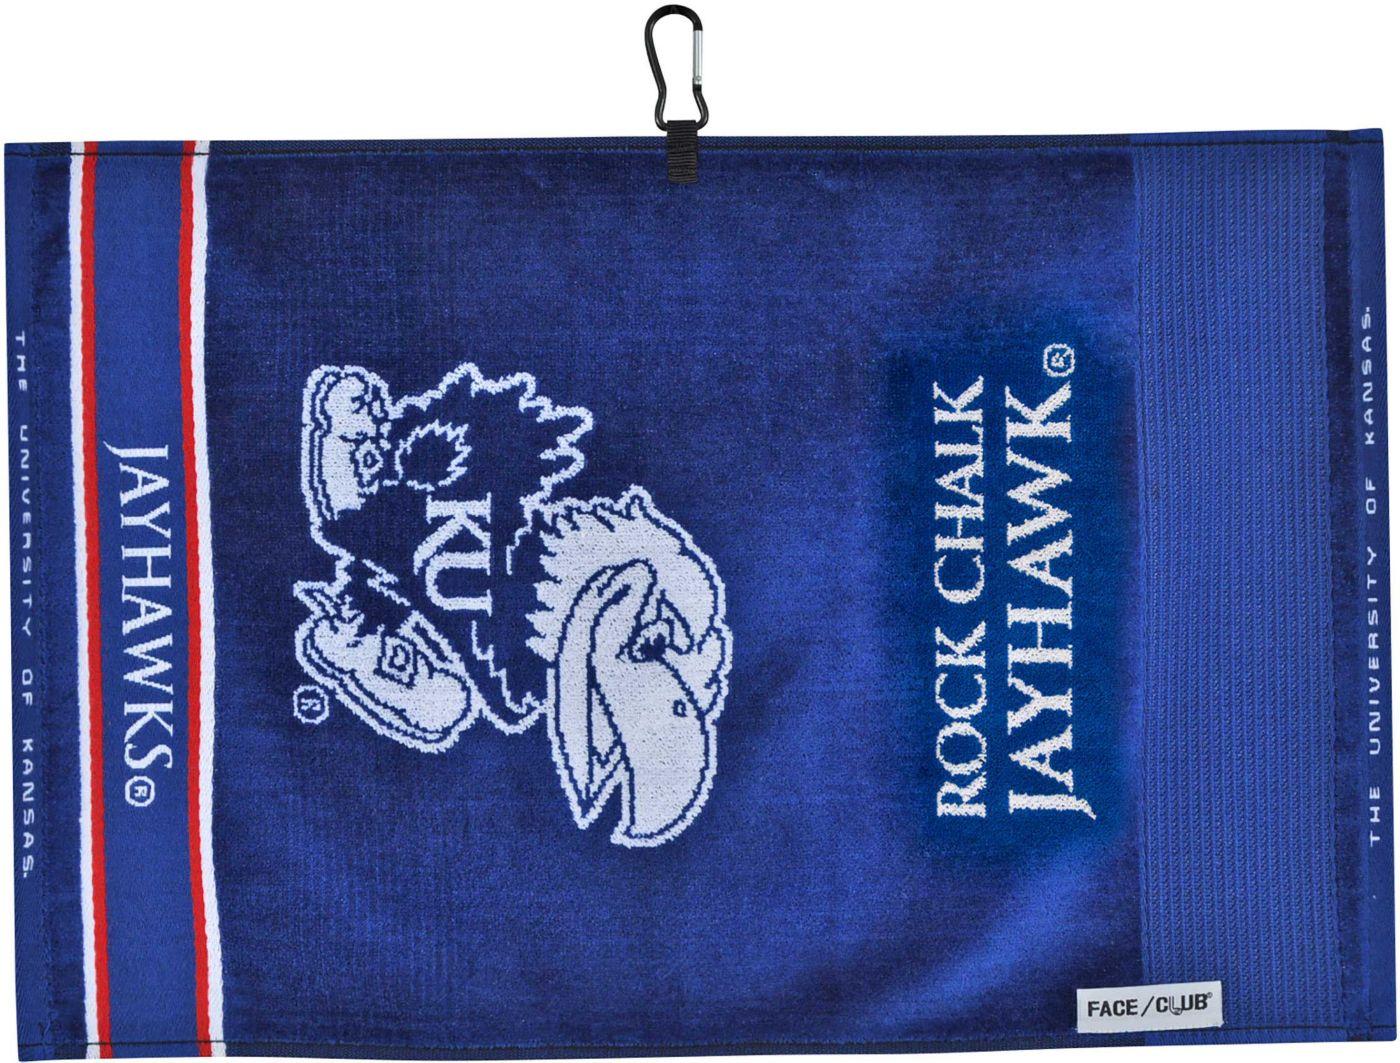 Team Effort Kansas Jayhawks Face/Club Jacquard Golf Towel